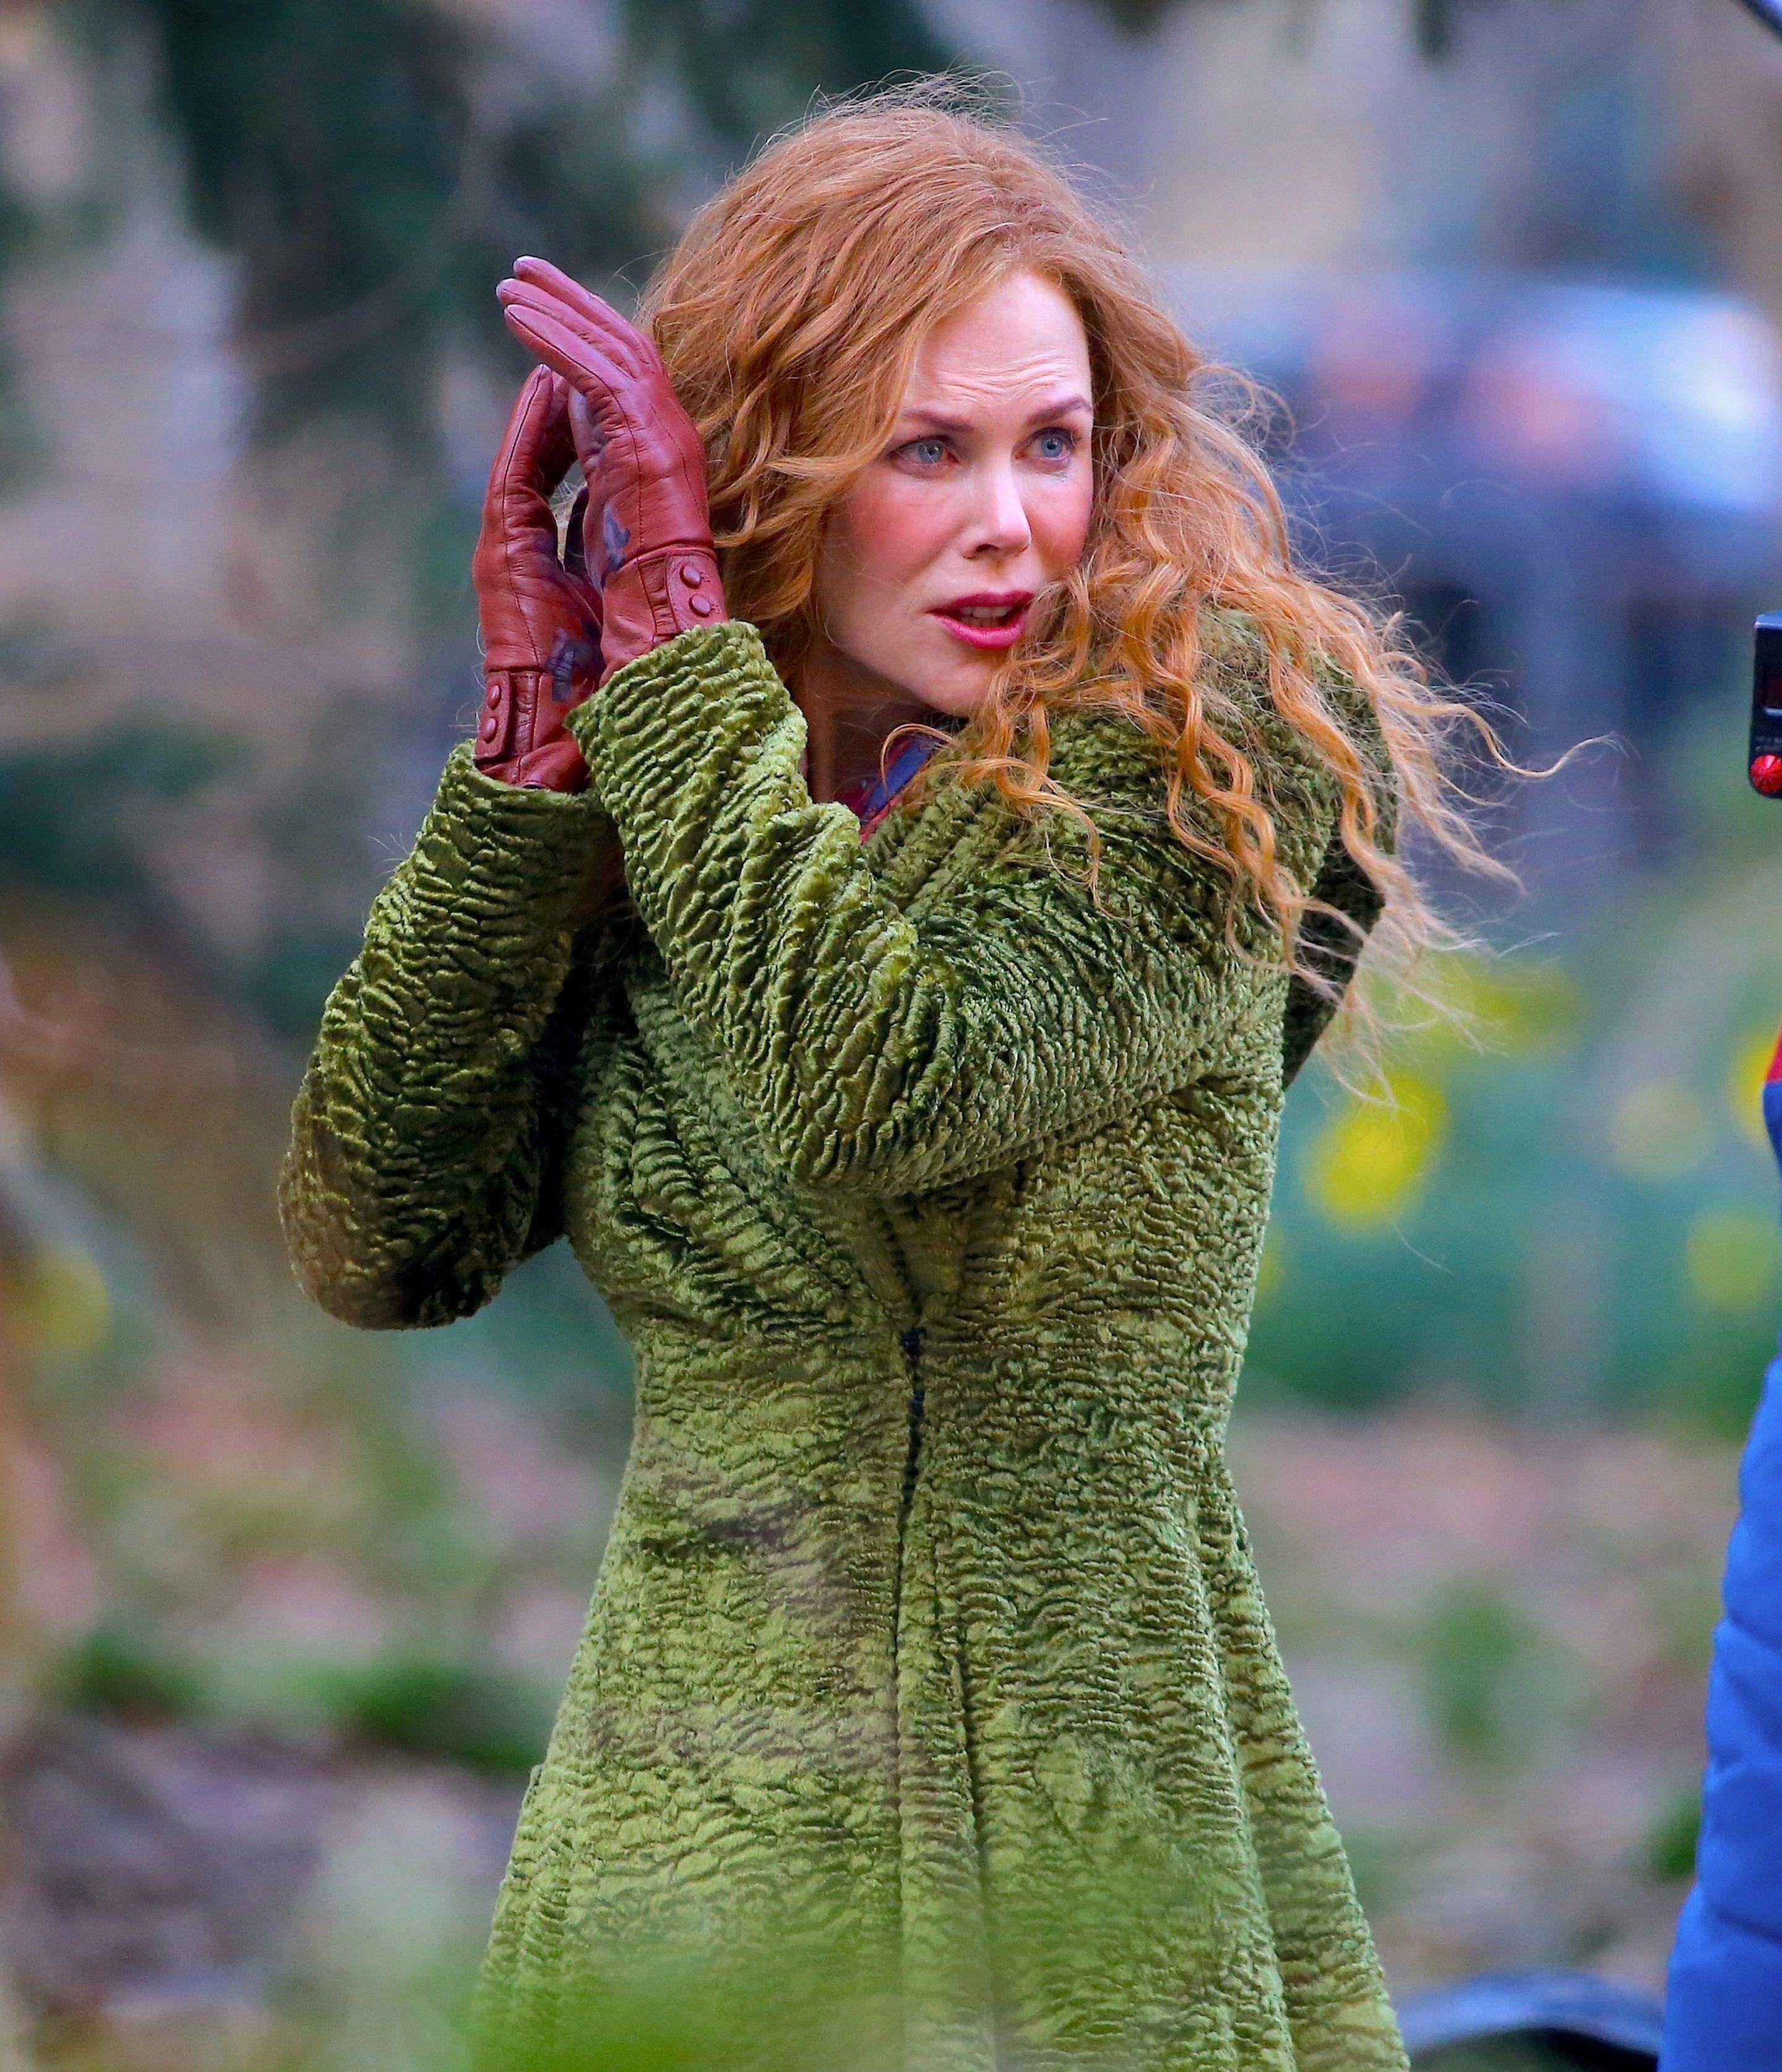 Nicole Kidman reunites with Big Little Lies creator in first look at thriller series The Undoing